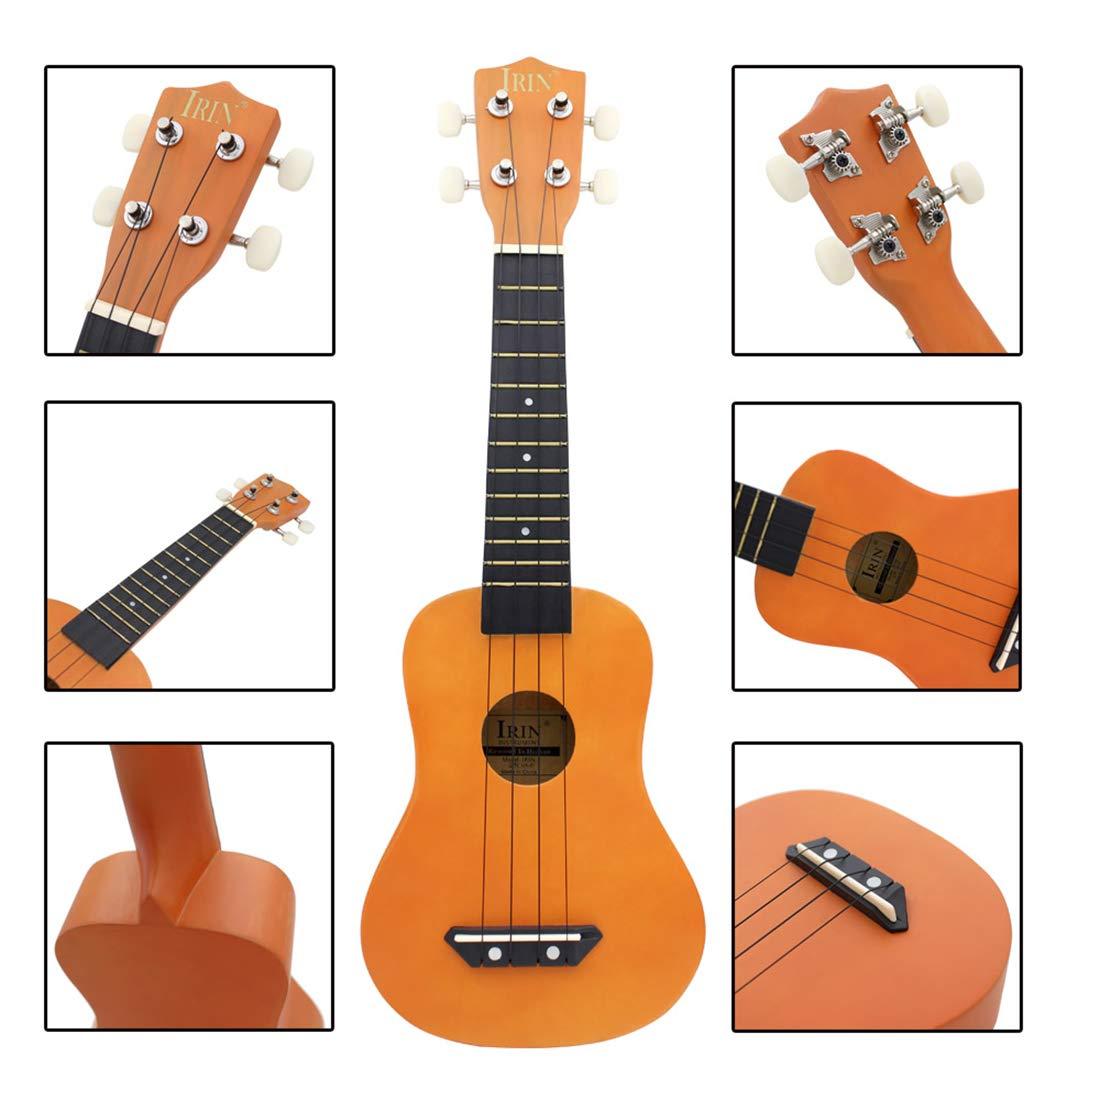 MRKE Ukelele Principiante Guitarra Niño Madera 21